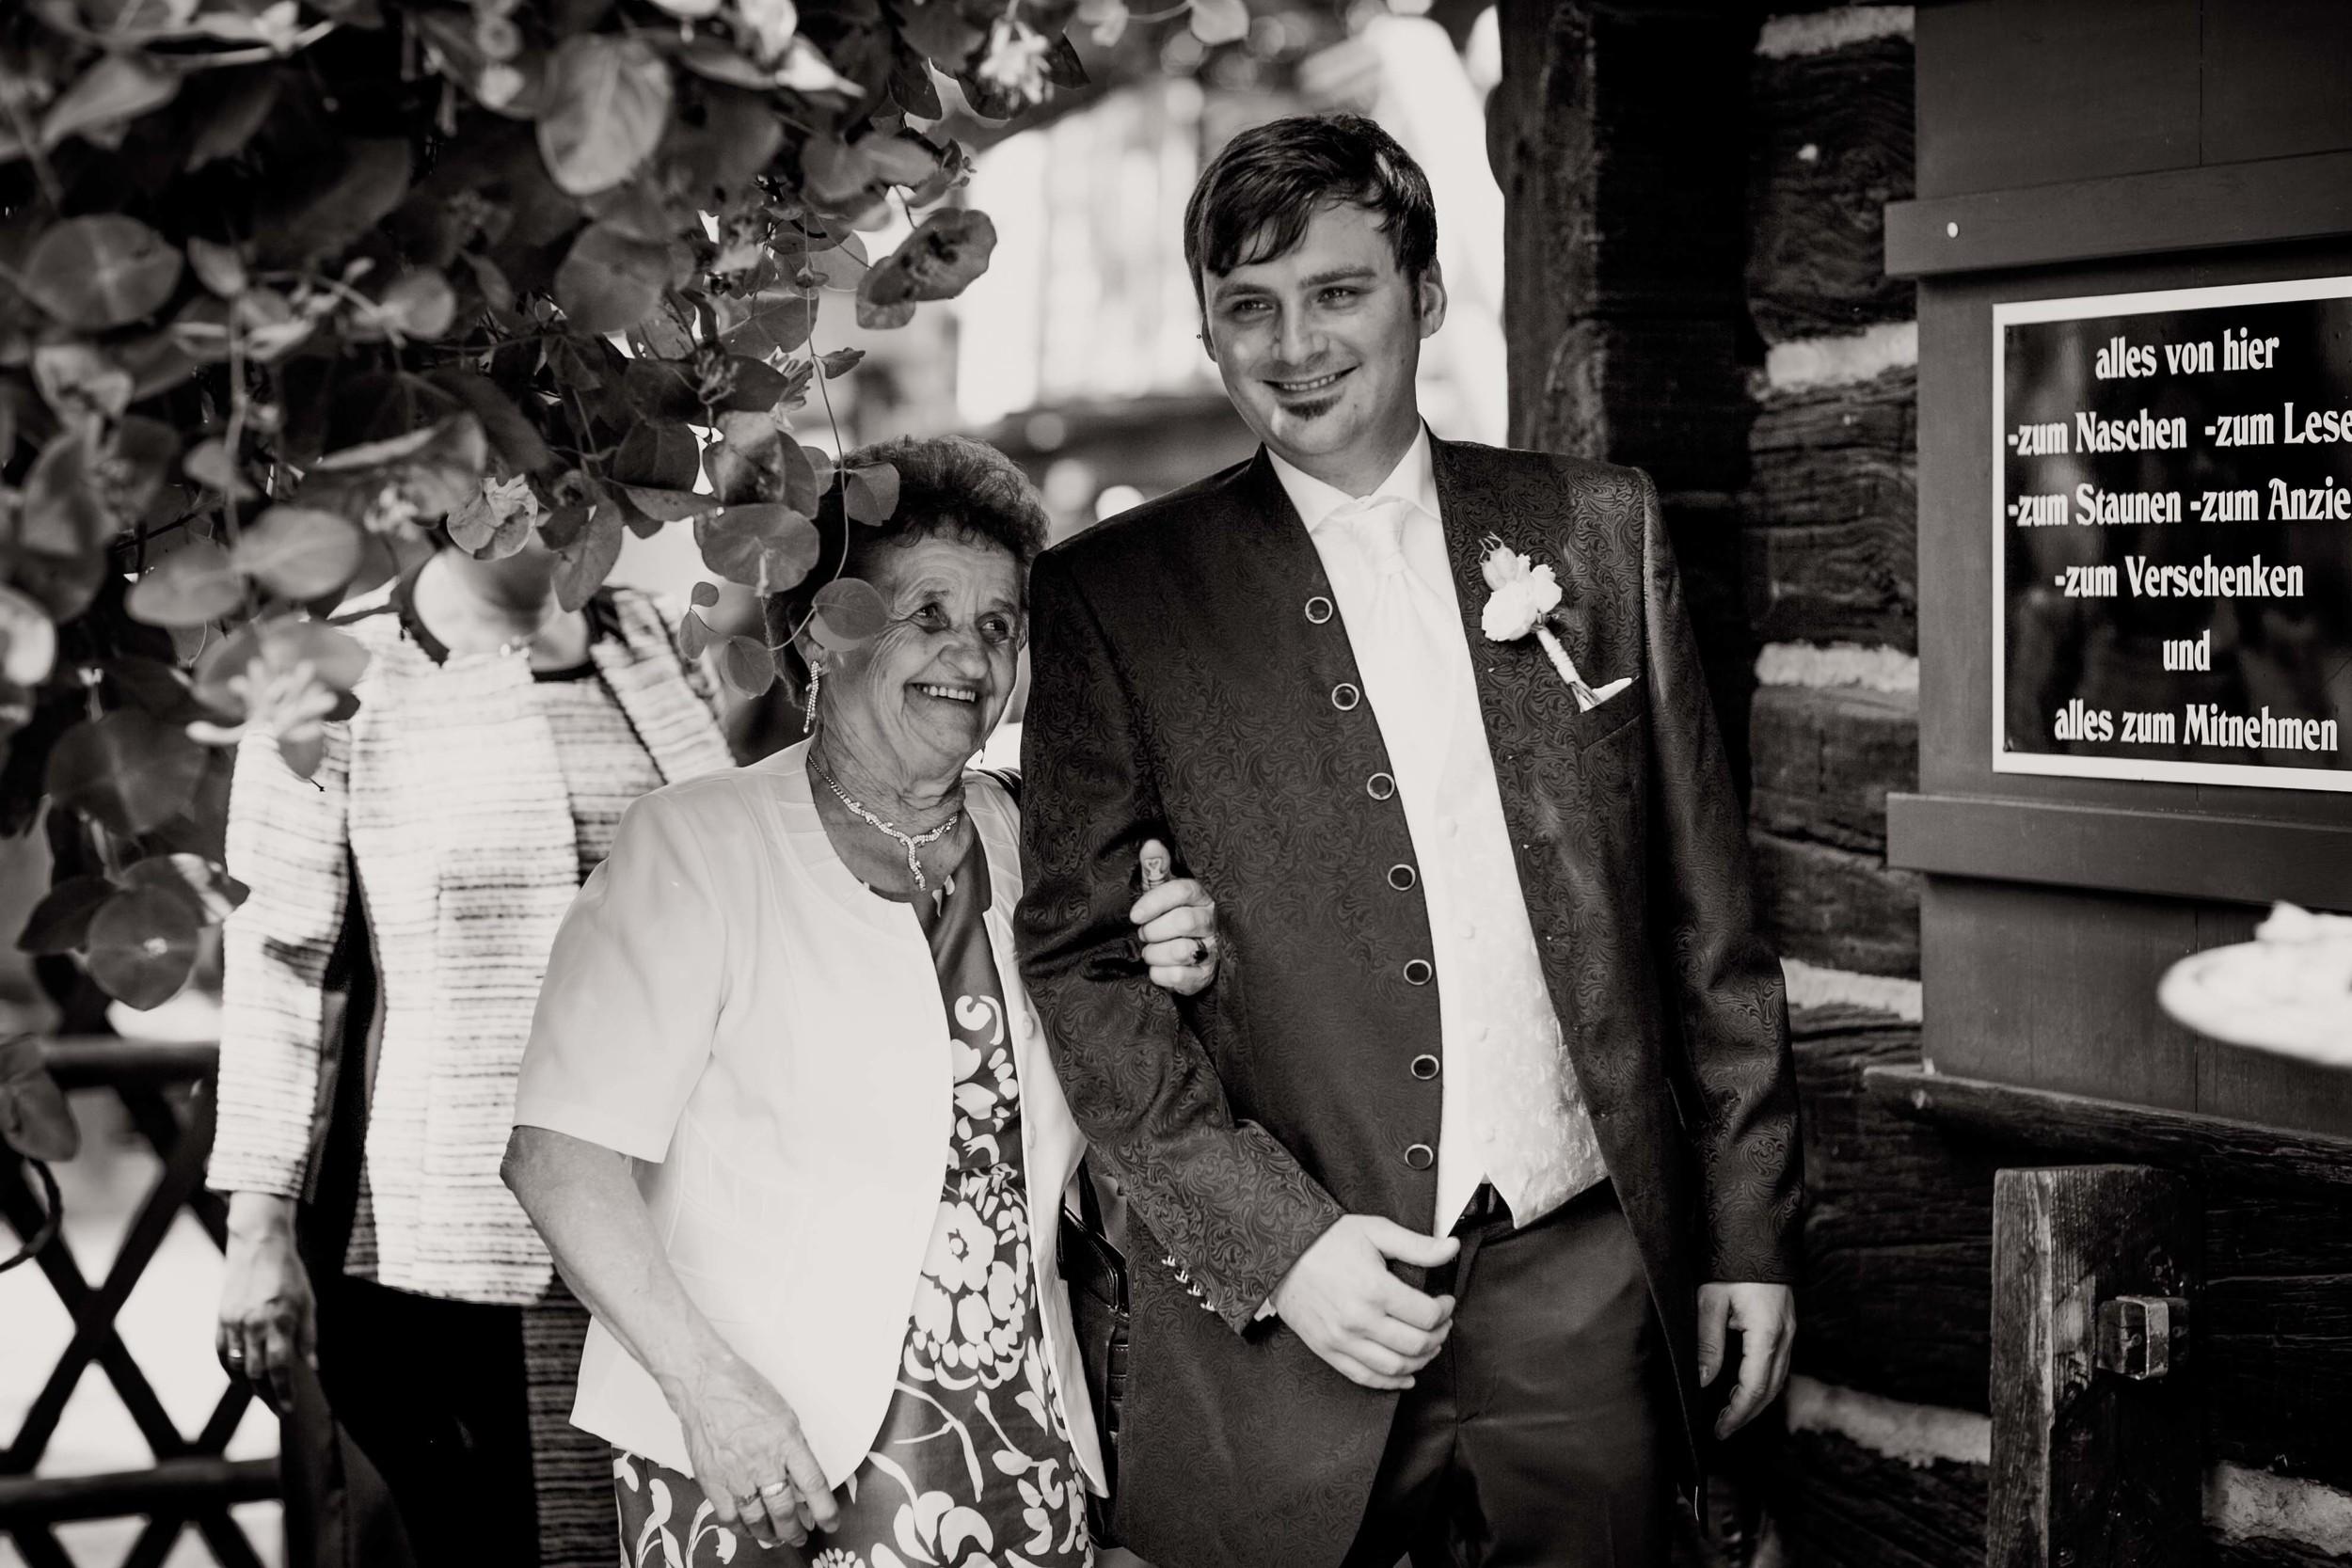 Spreewald Hochzeitsfotografie_Fran Burrows Fotografie-10.jpg